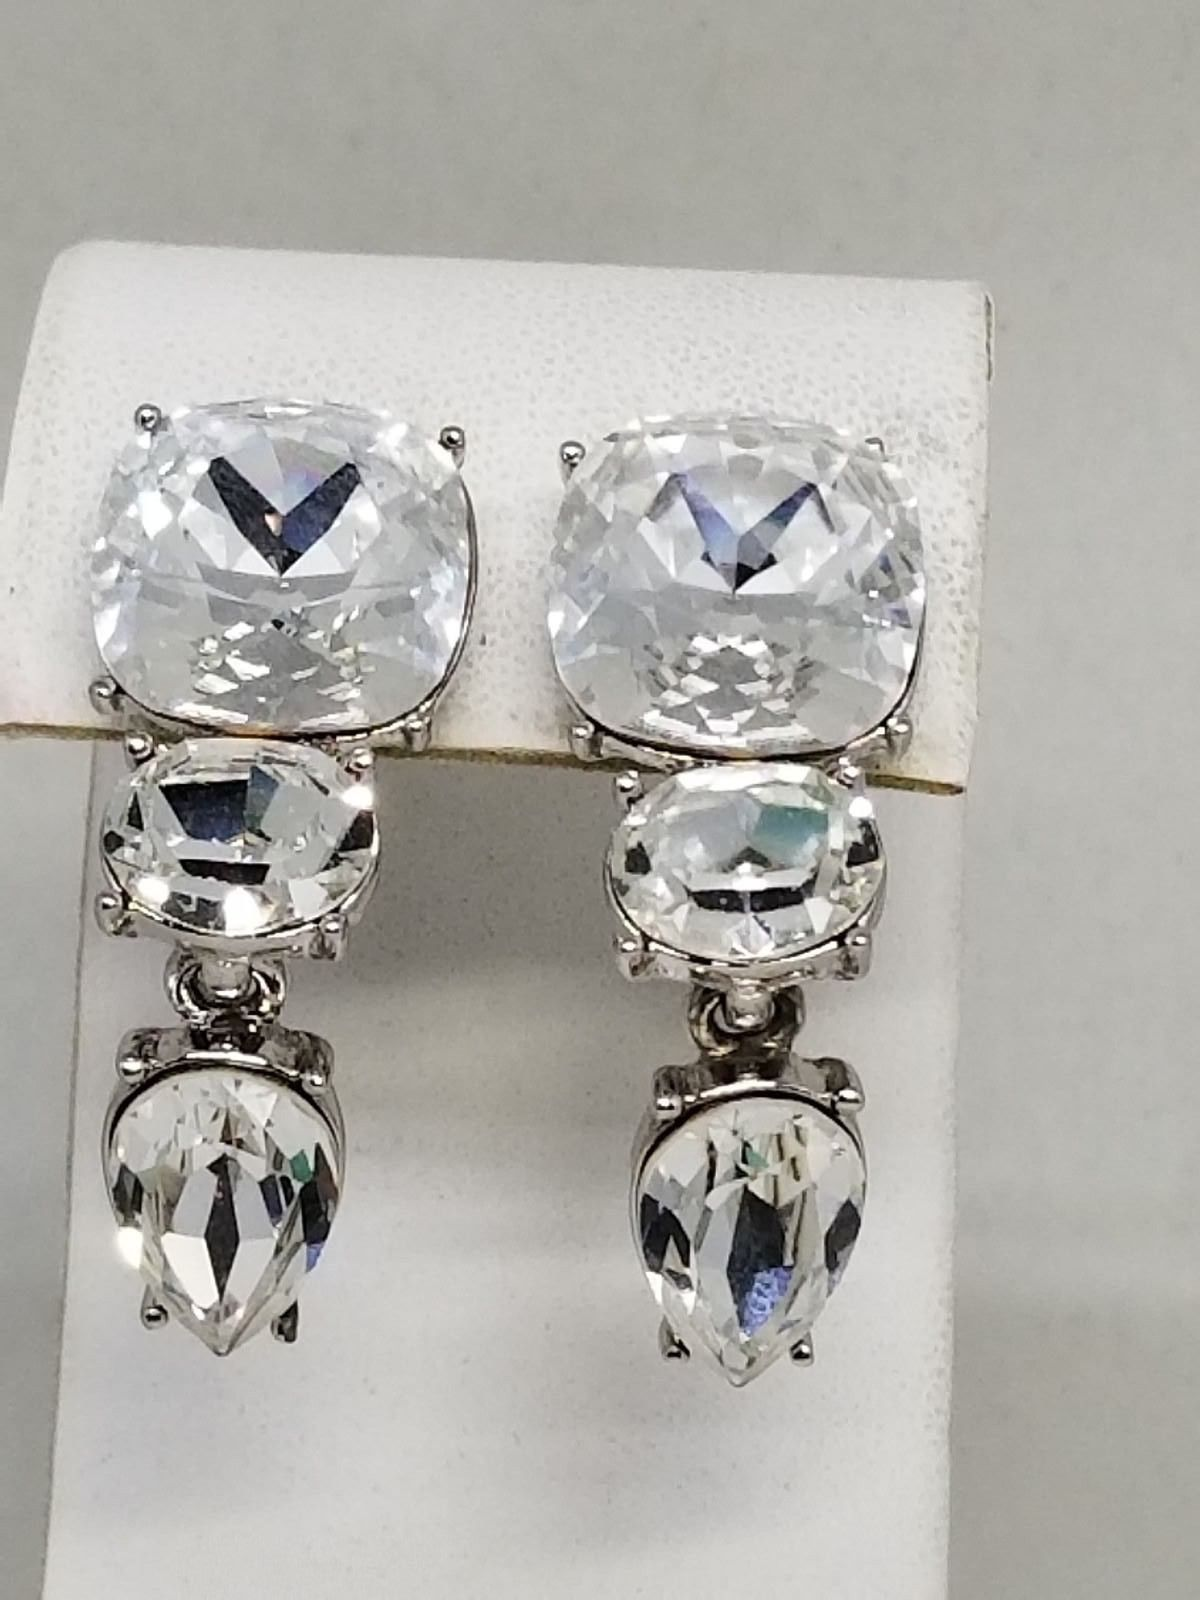 Monet Fantastic Huge Faceted Rhinestone Clip On Vintage Earrings for BRIDE